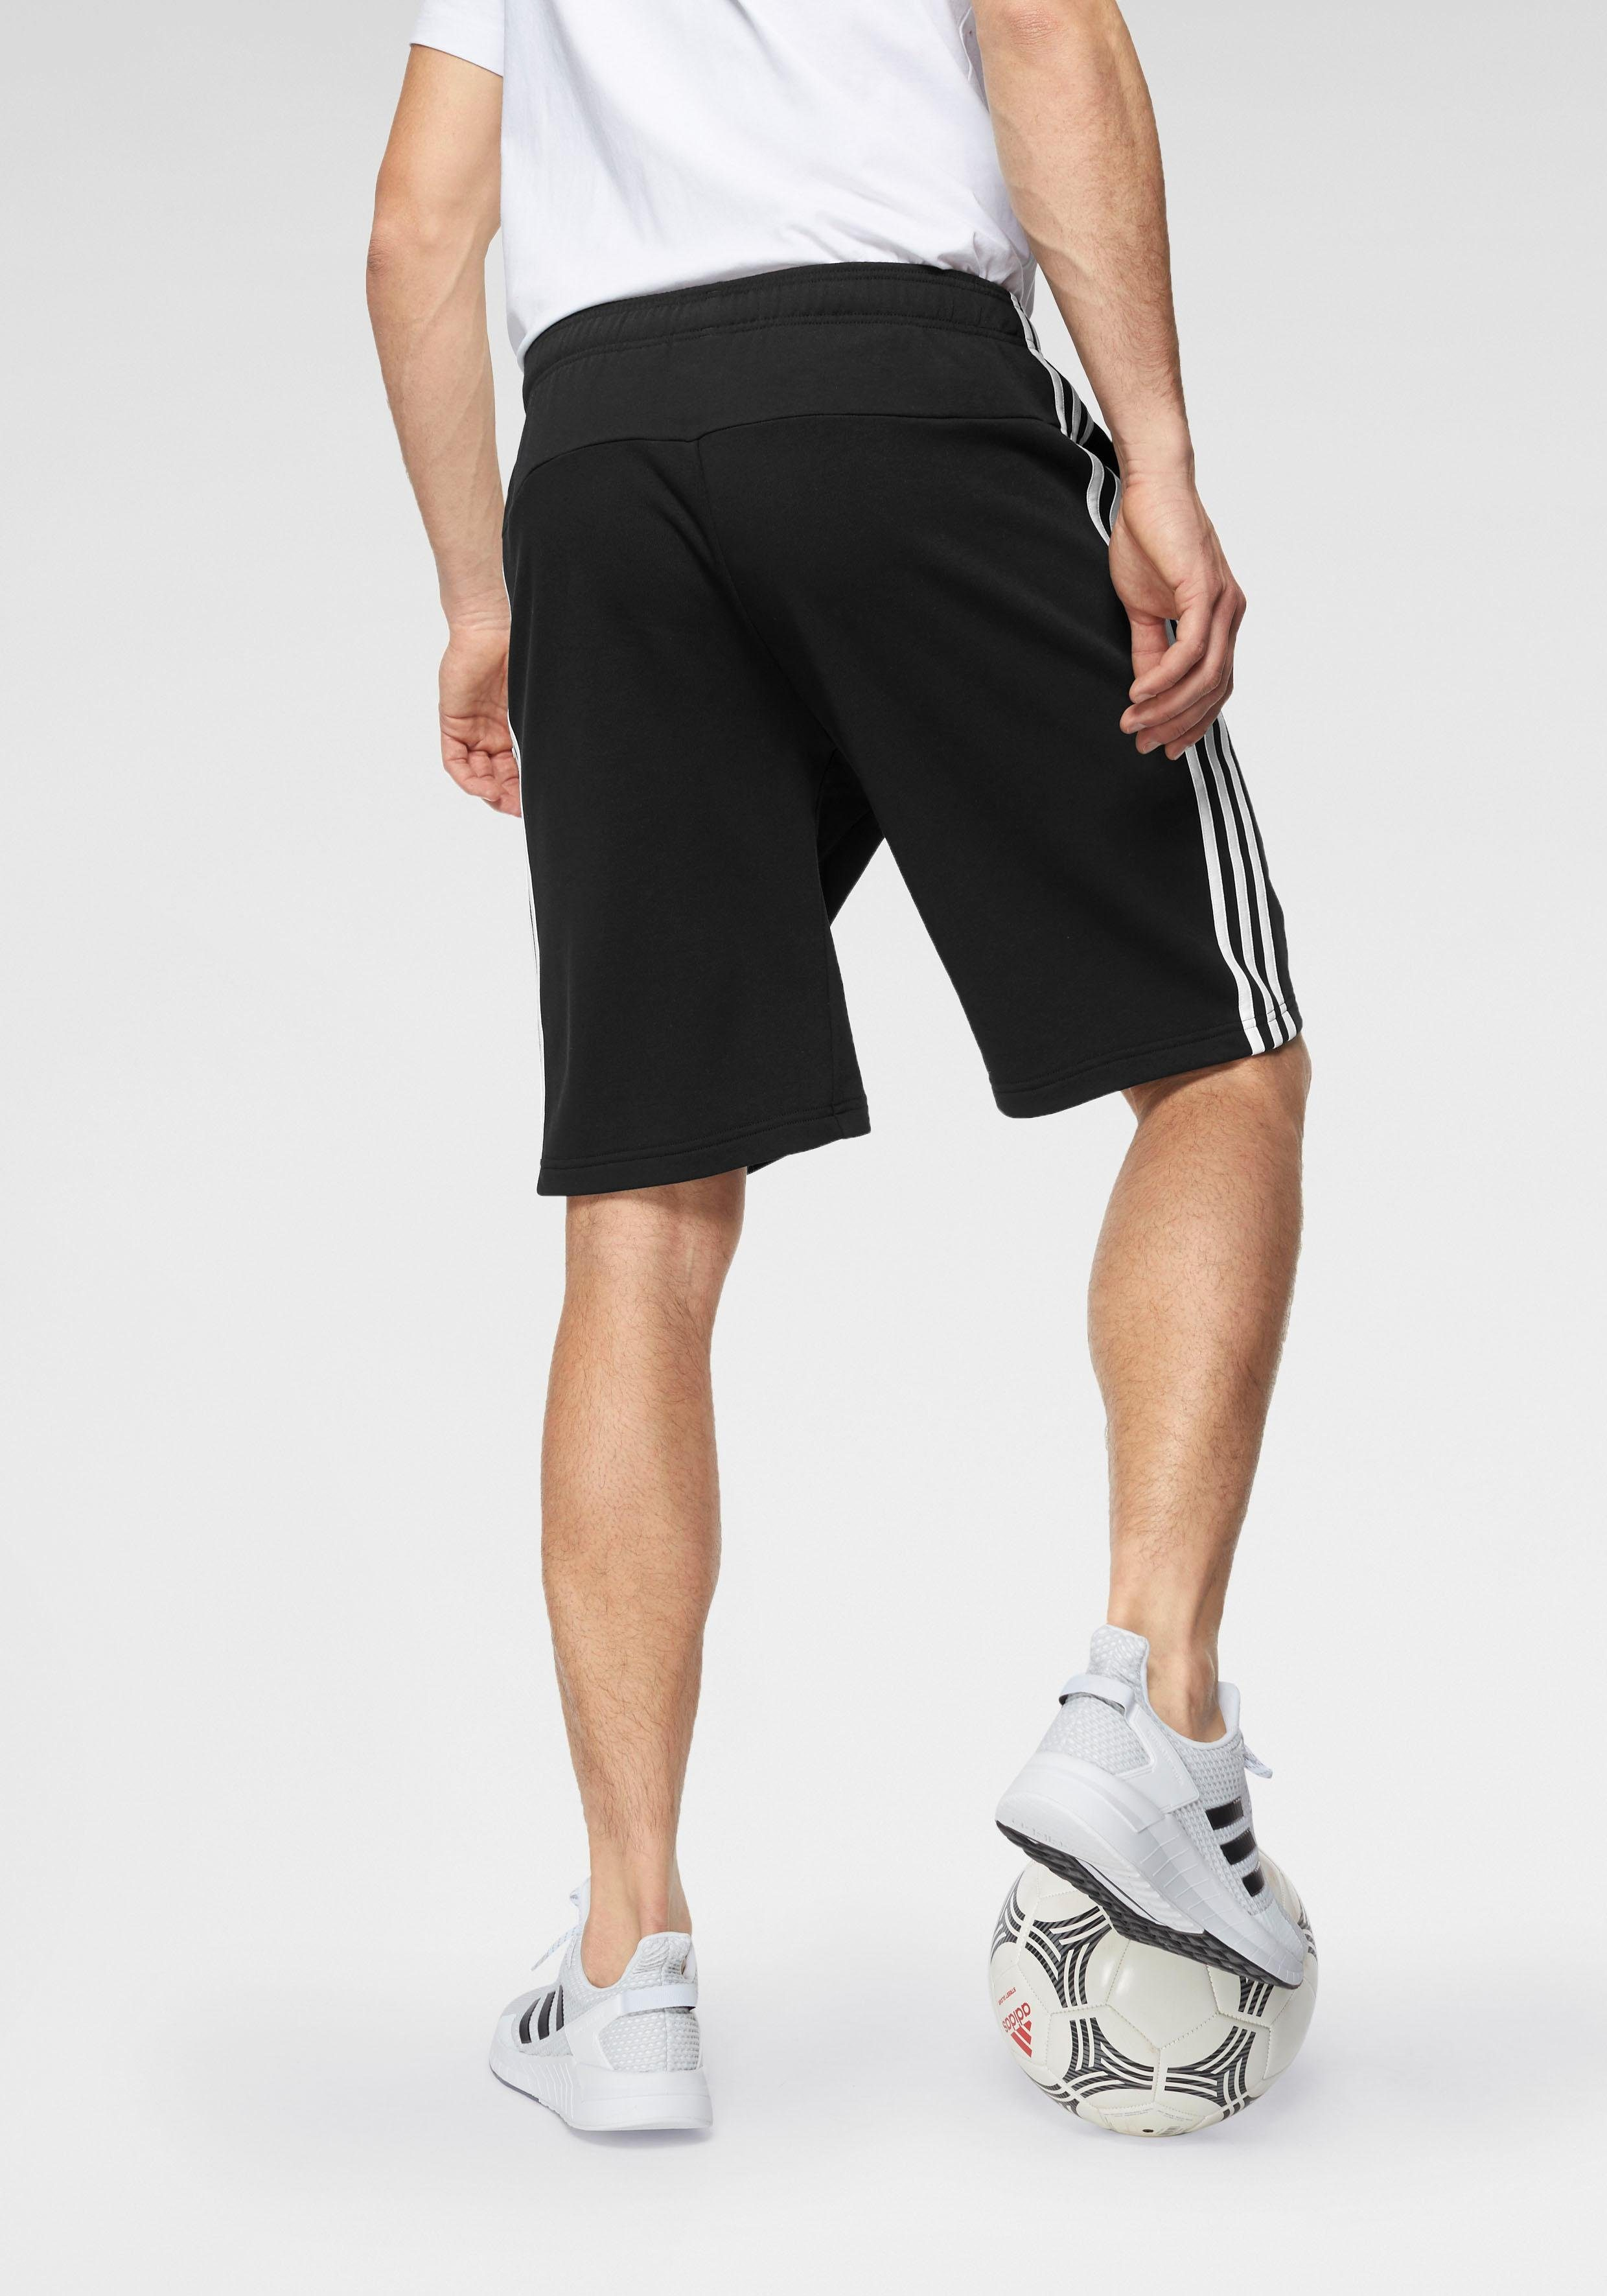 adidas short »E 3 STRIPES SHORT FT«